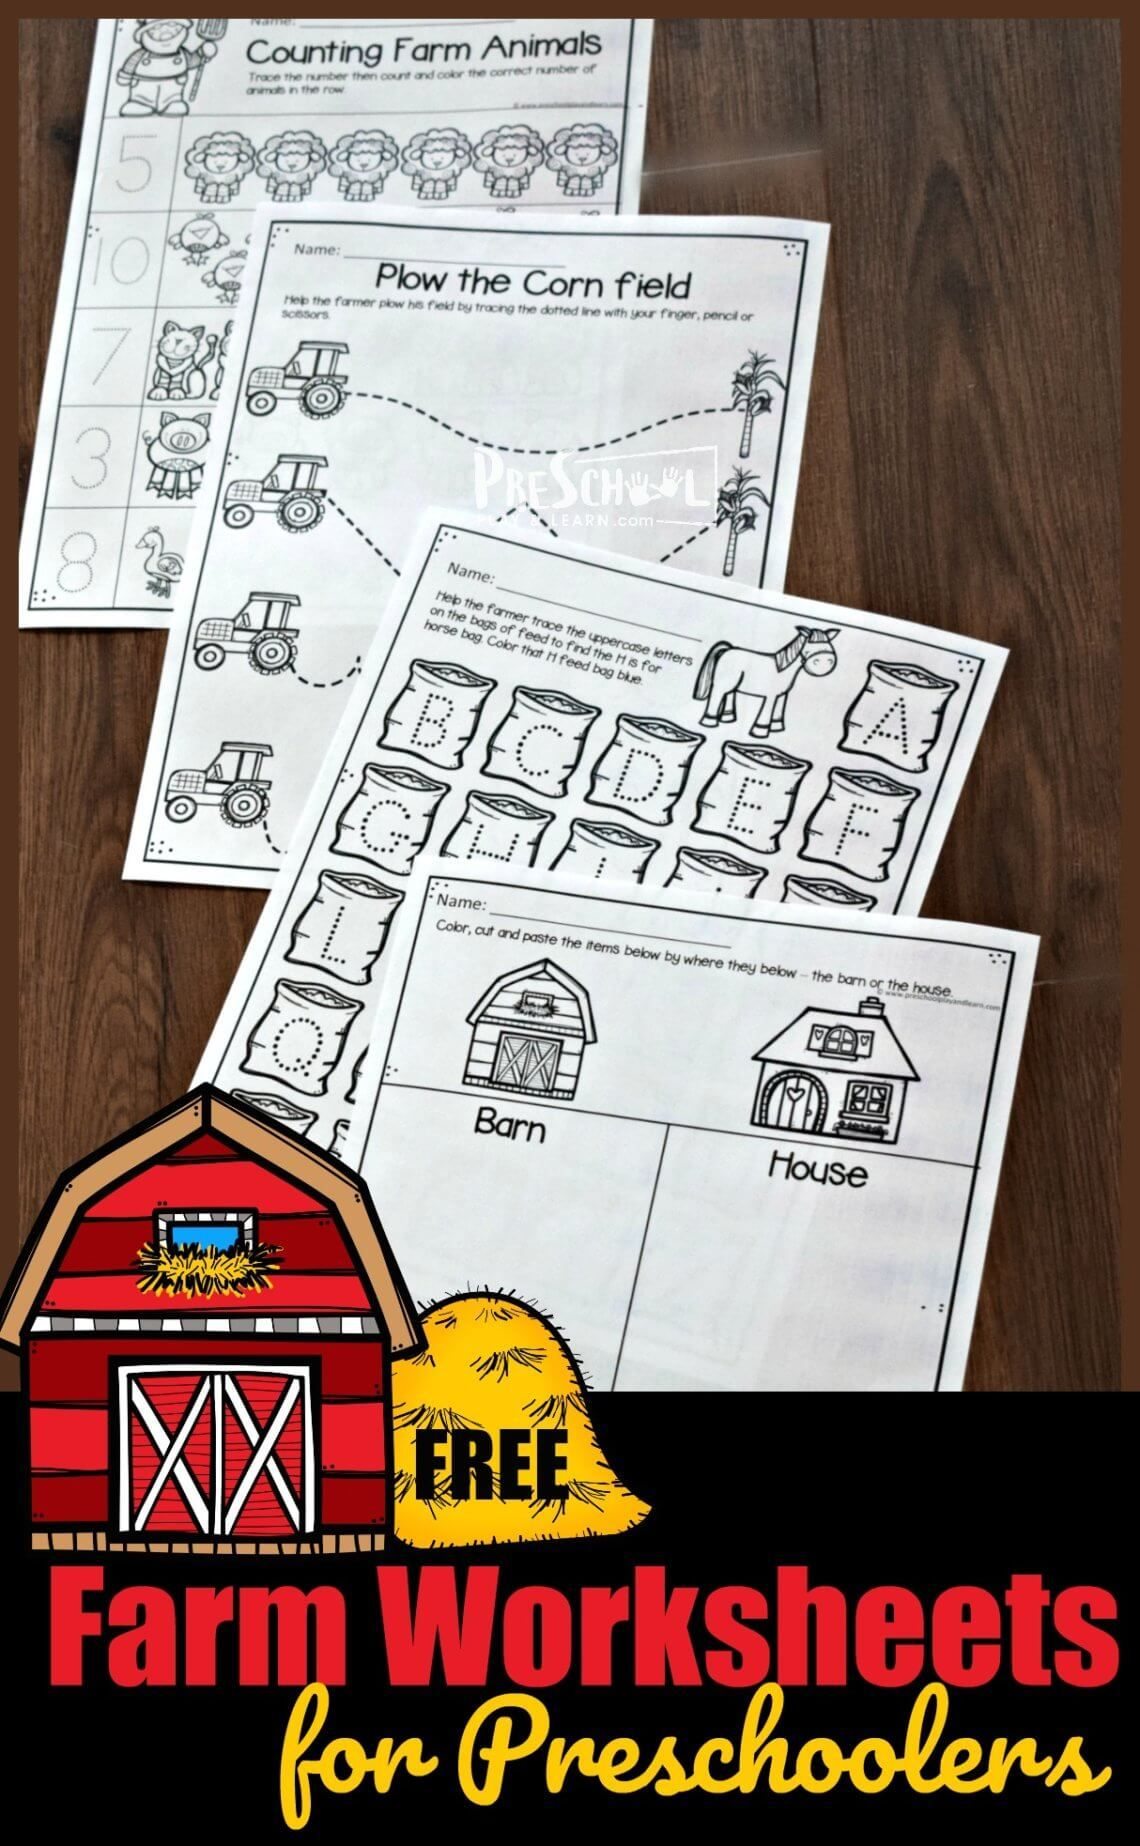 Free Farm Worksheets For Preschoolers